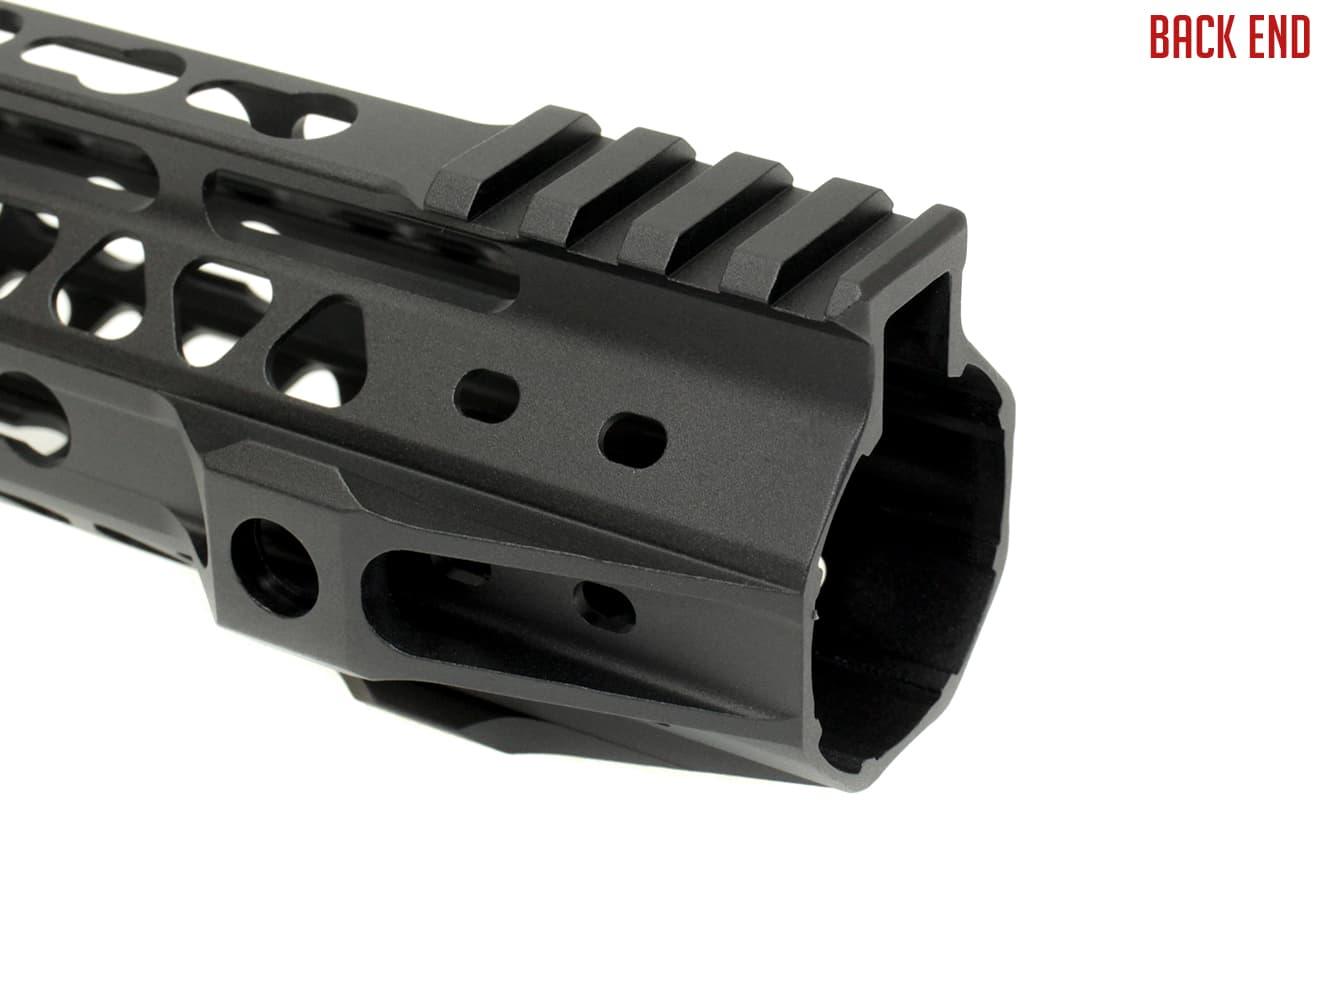 12 CNC Aluminum Key Mod Rail Handguard for Marui G&P SR Paintball M